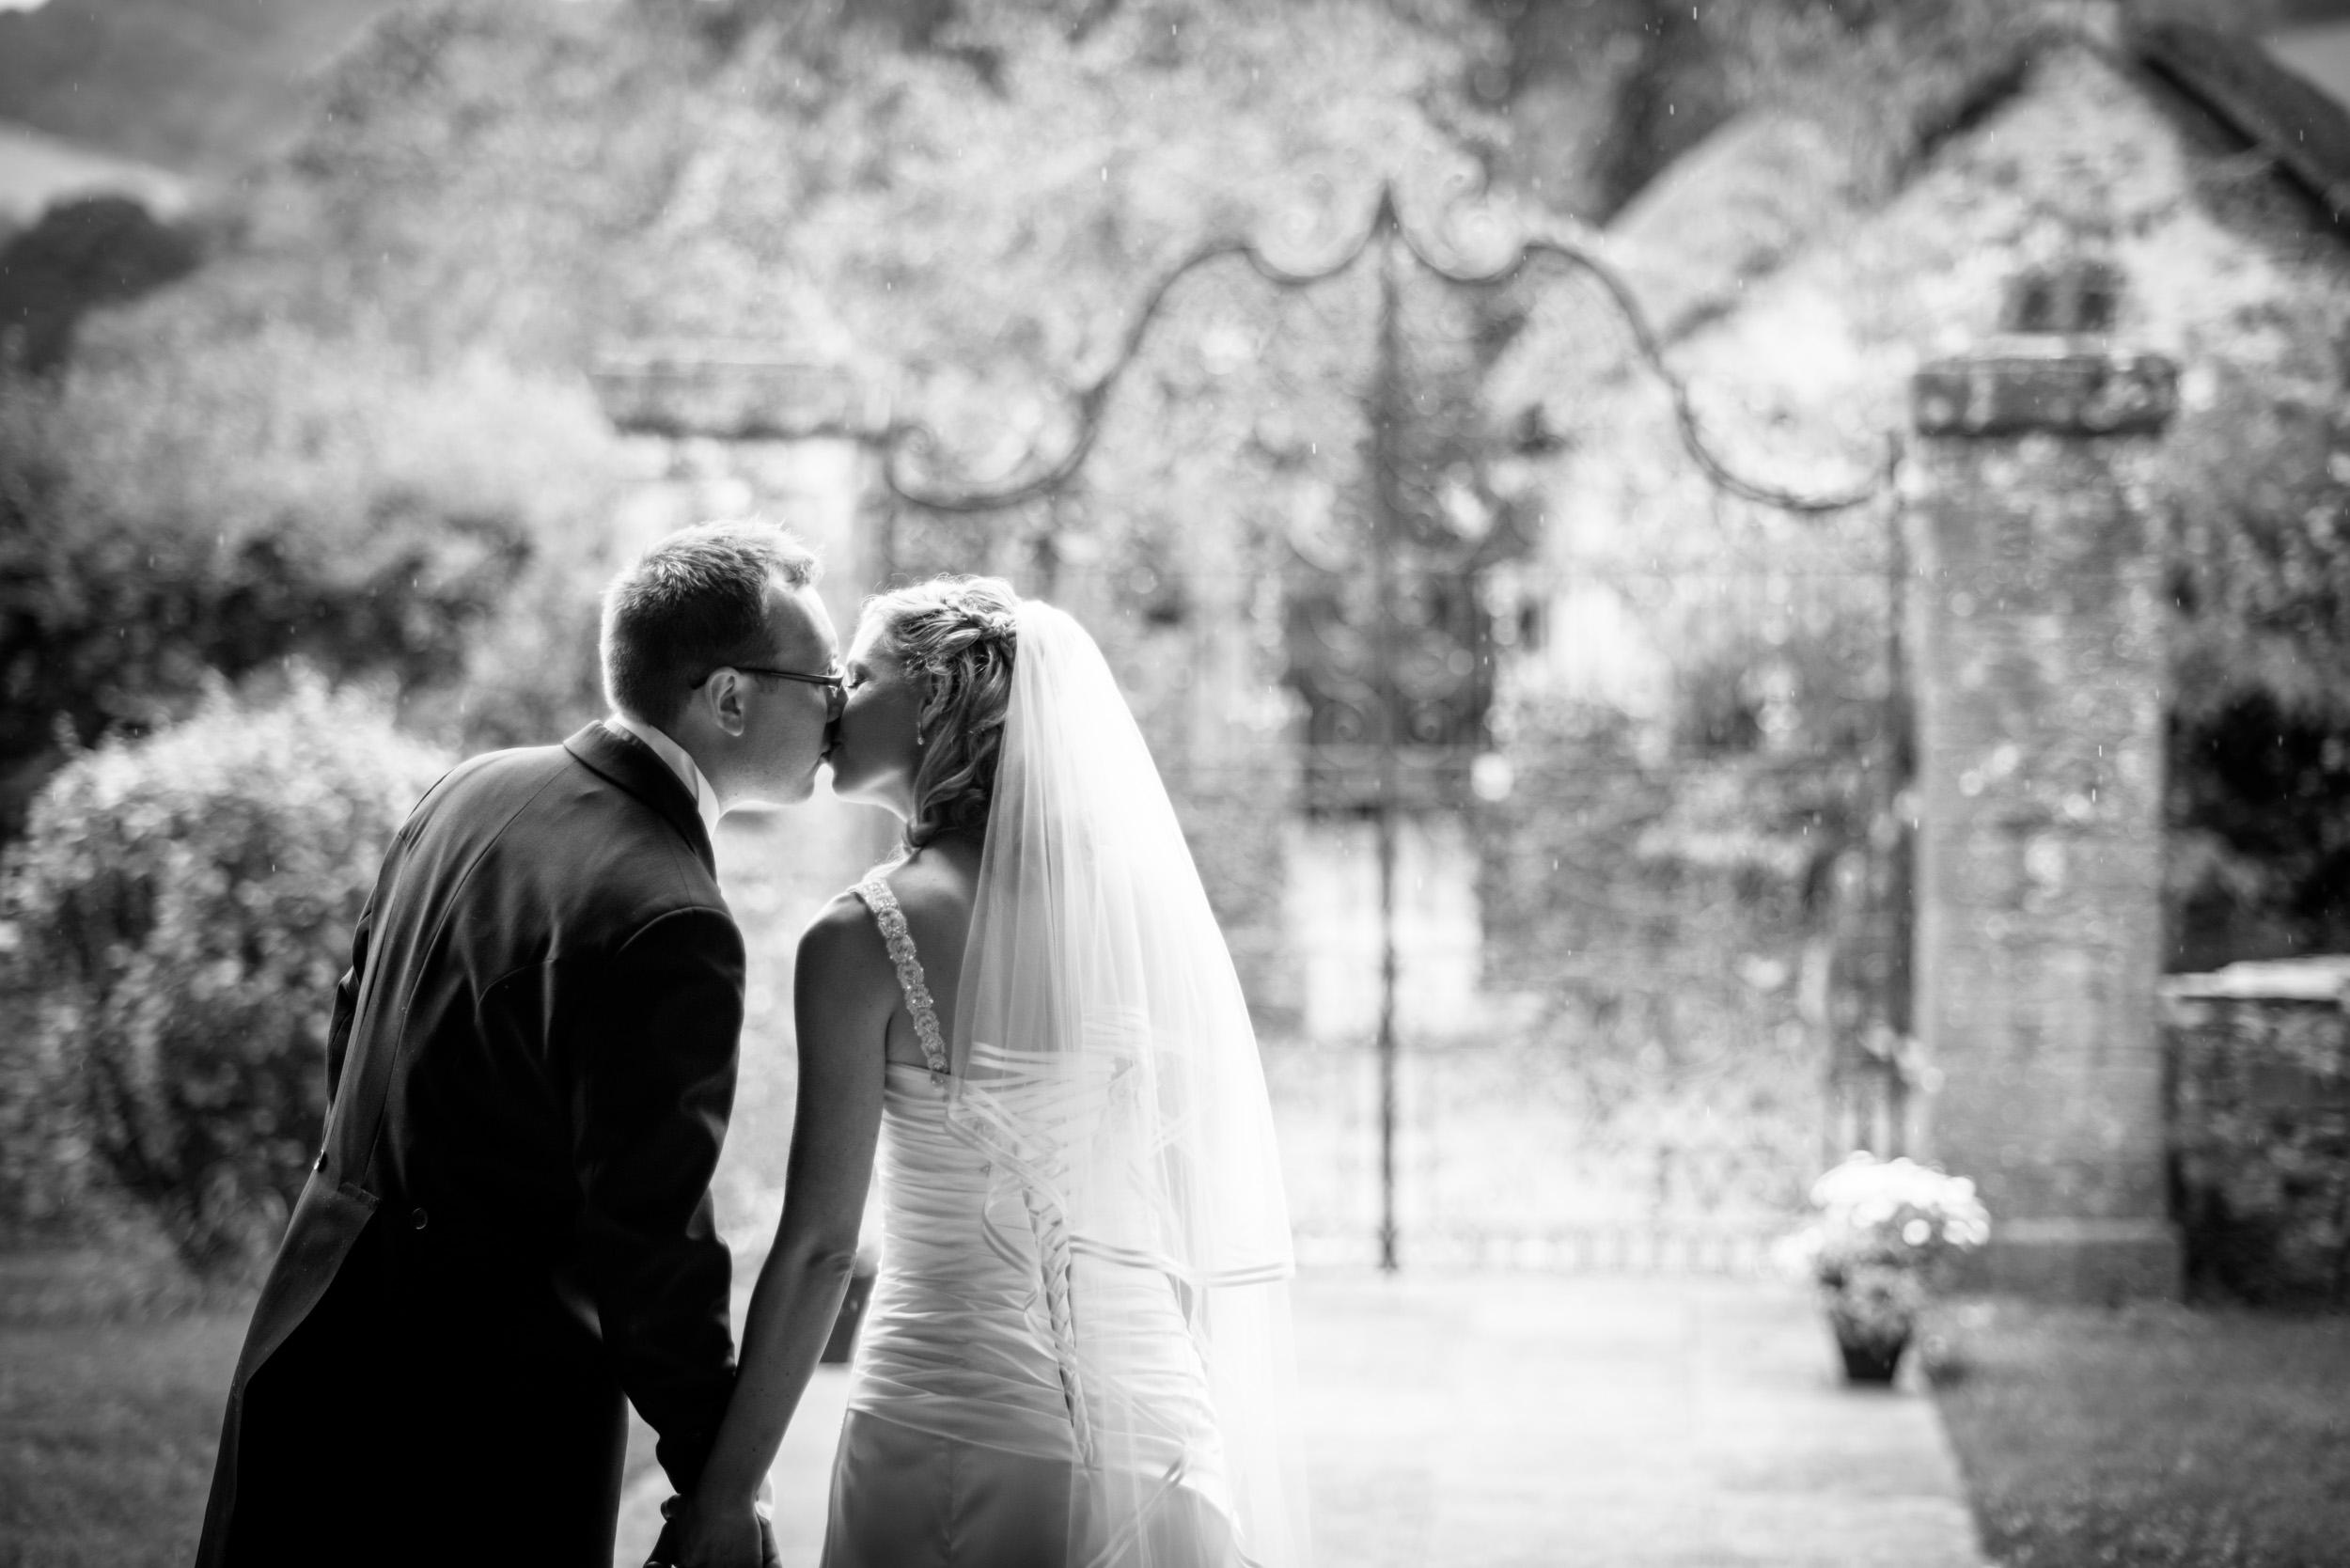 bride-groom-kissing-rain-1.jpg